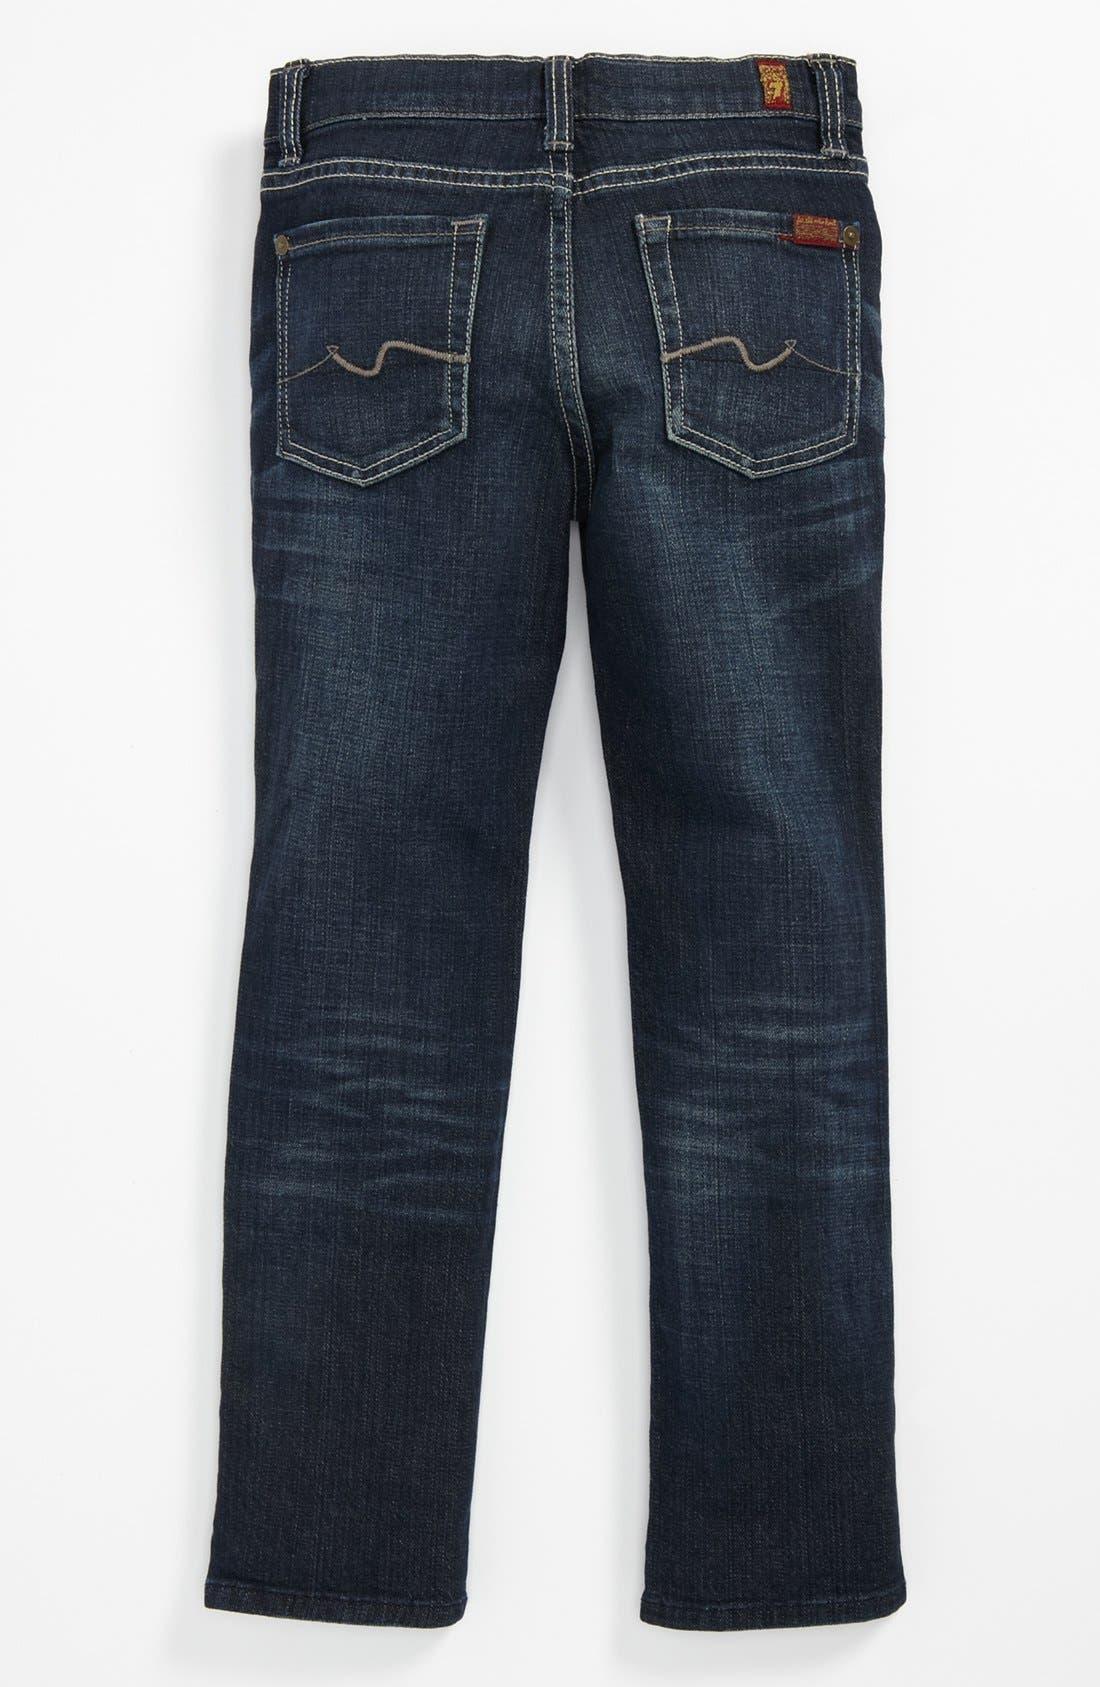 Alternate Image 1 Selected - 7 For All Mankind® 'Slimmy' Slim Straight Leg Jeans (Little Boys & Big Boys)